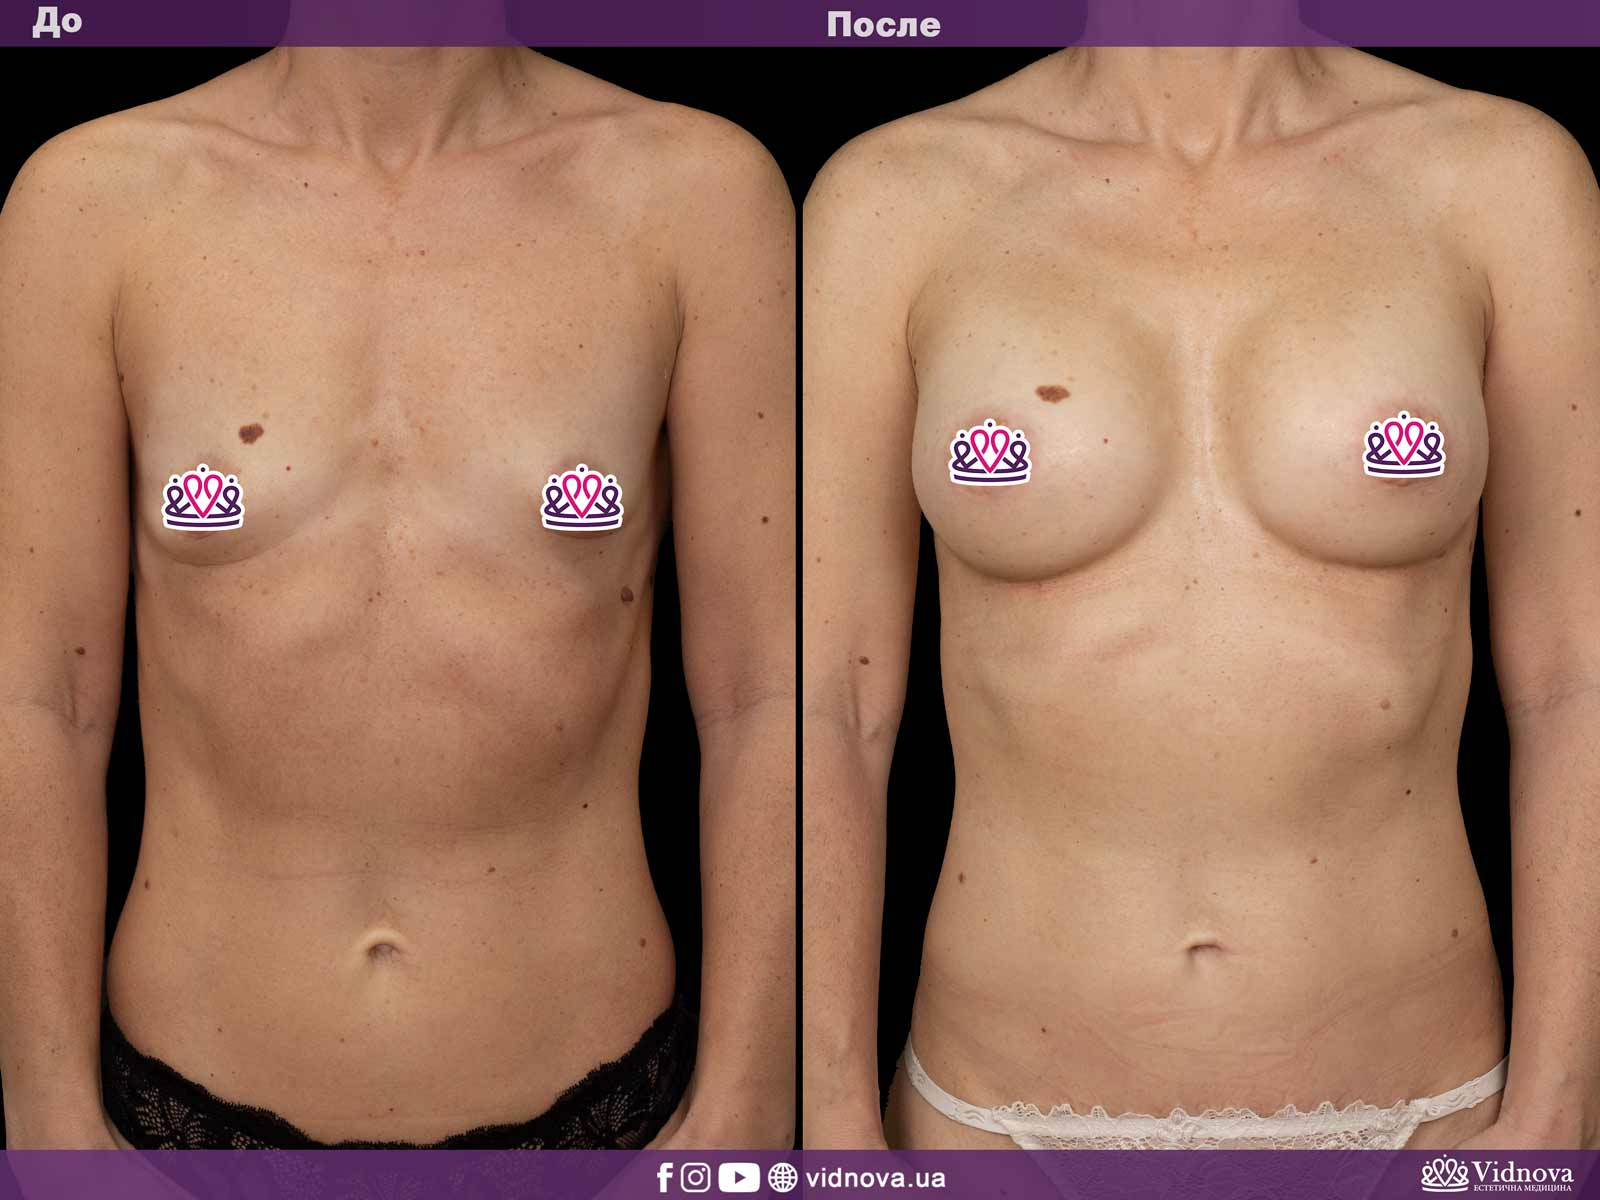 Увеличение груди: Фото ДО и ПОСЛЕ - Пример №20-1 - Клиника Vidnova